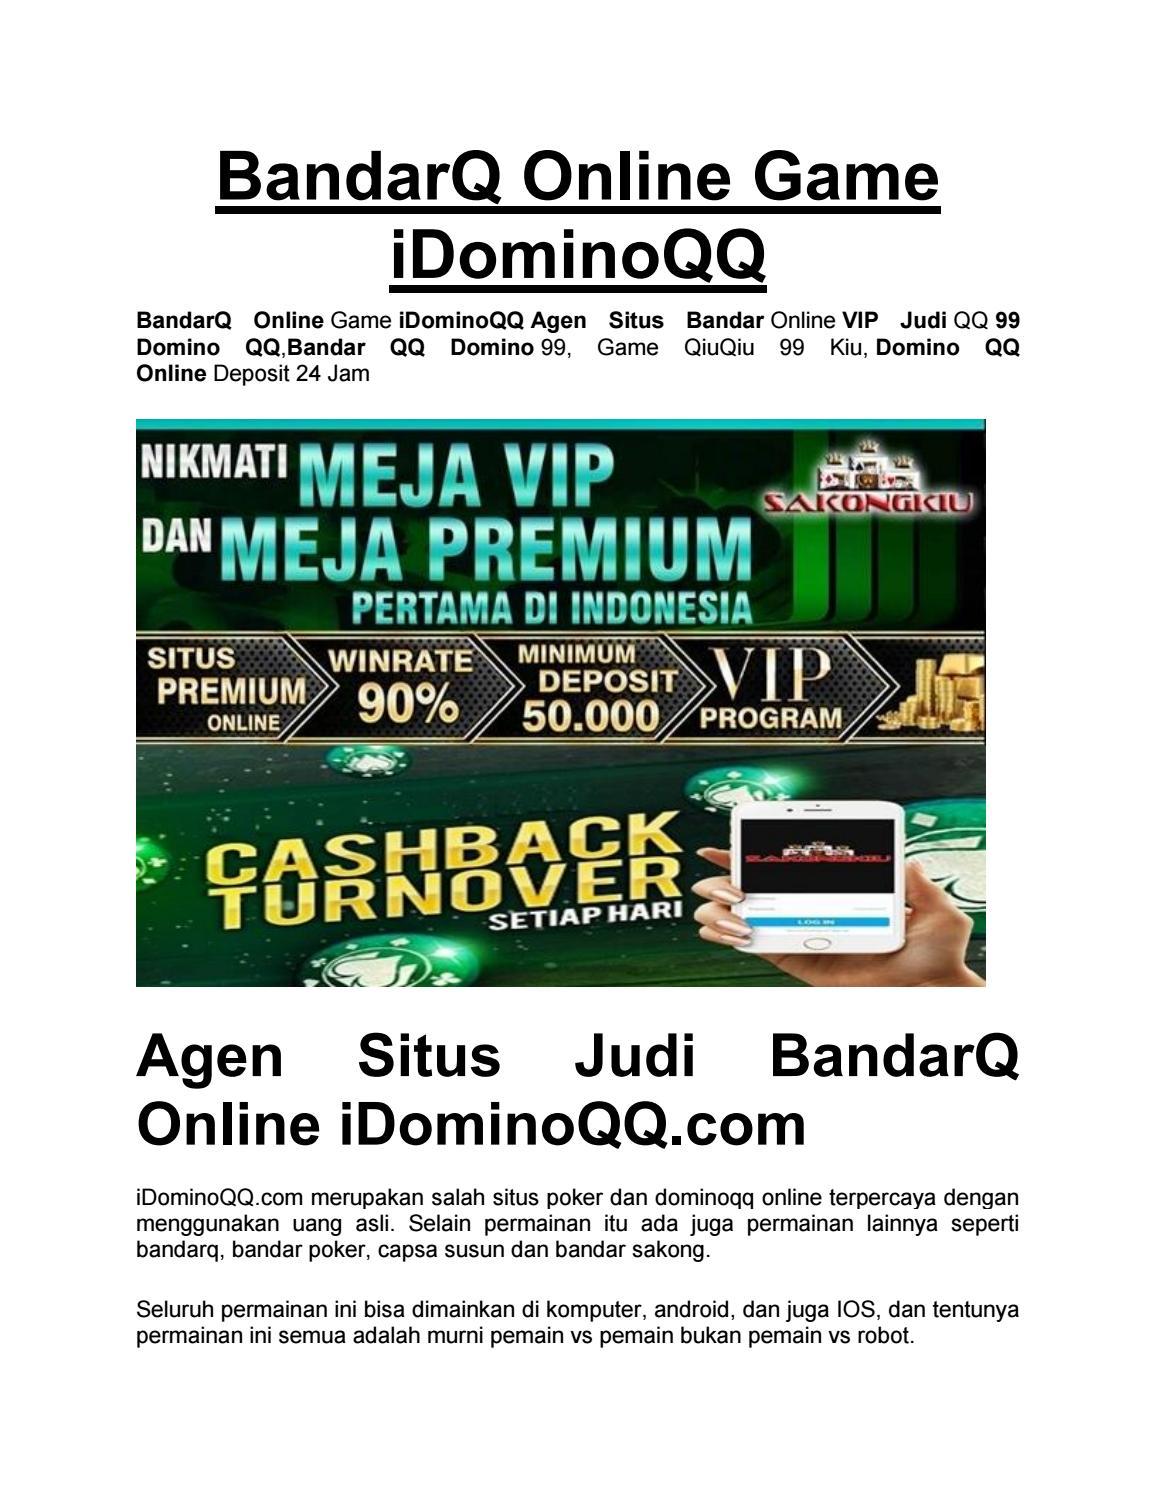 Bandarq Online Game Idominoqq By Wdominoqq Issuu